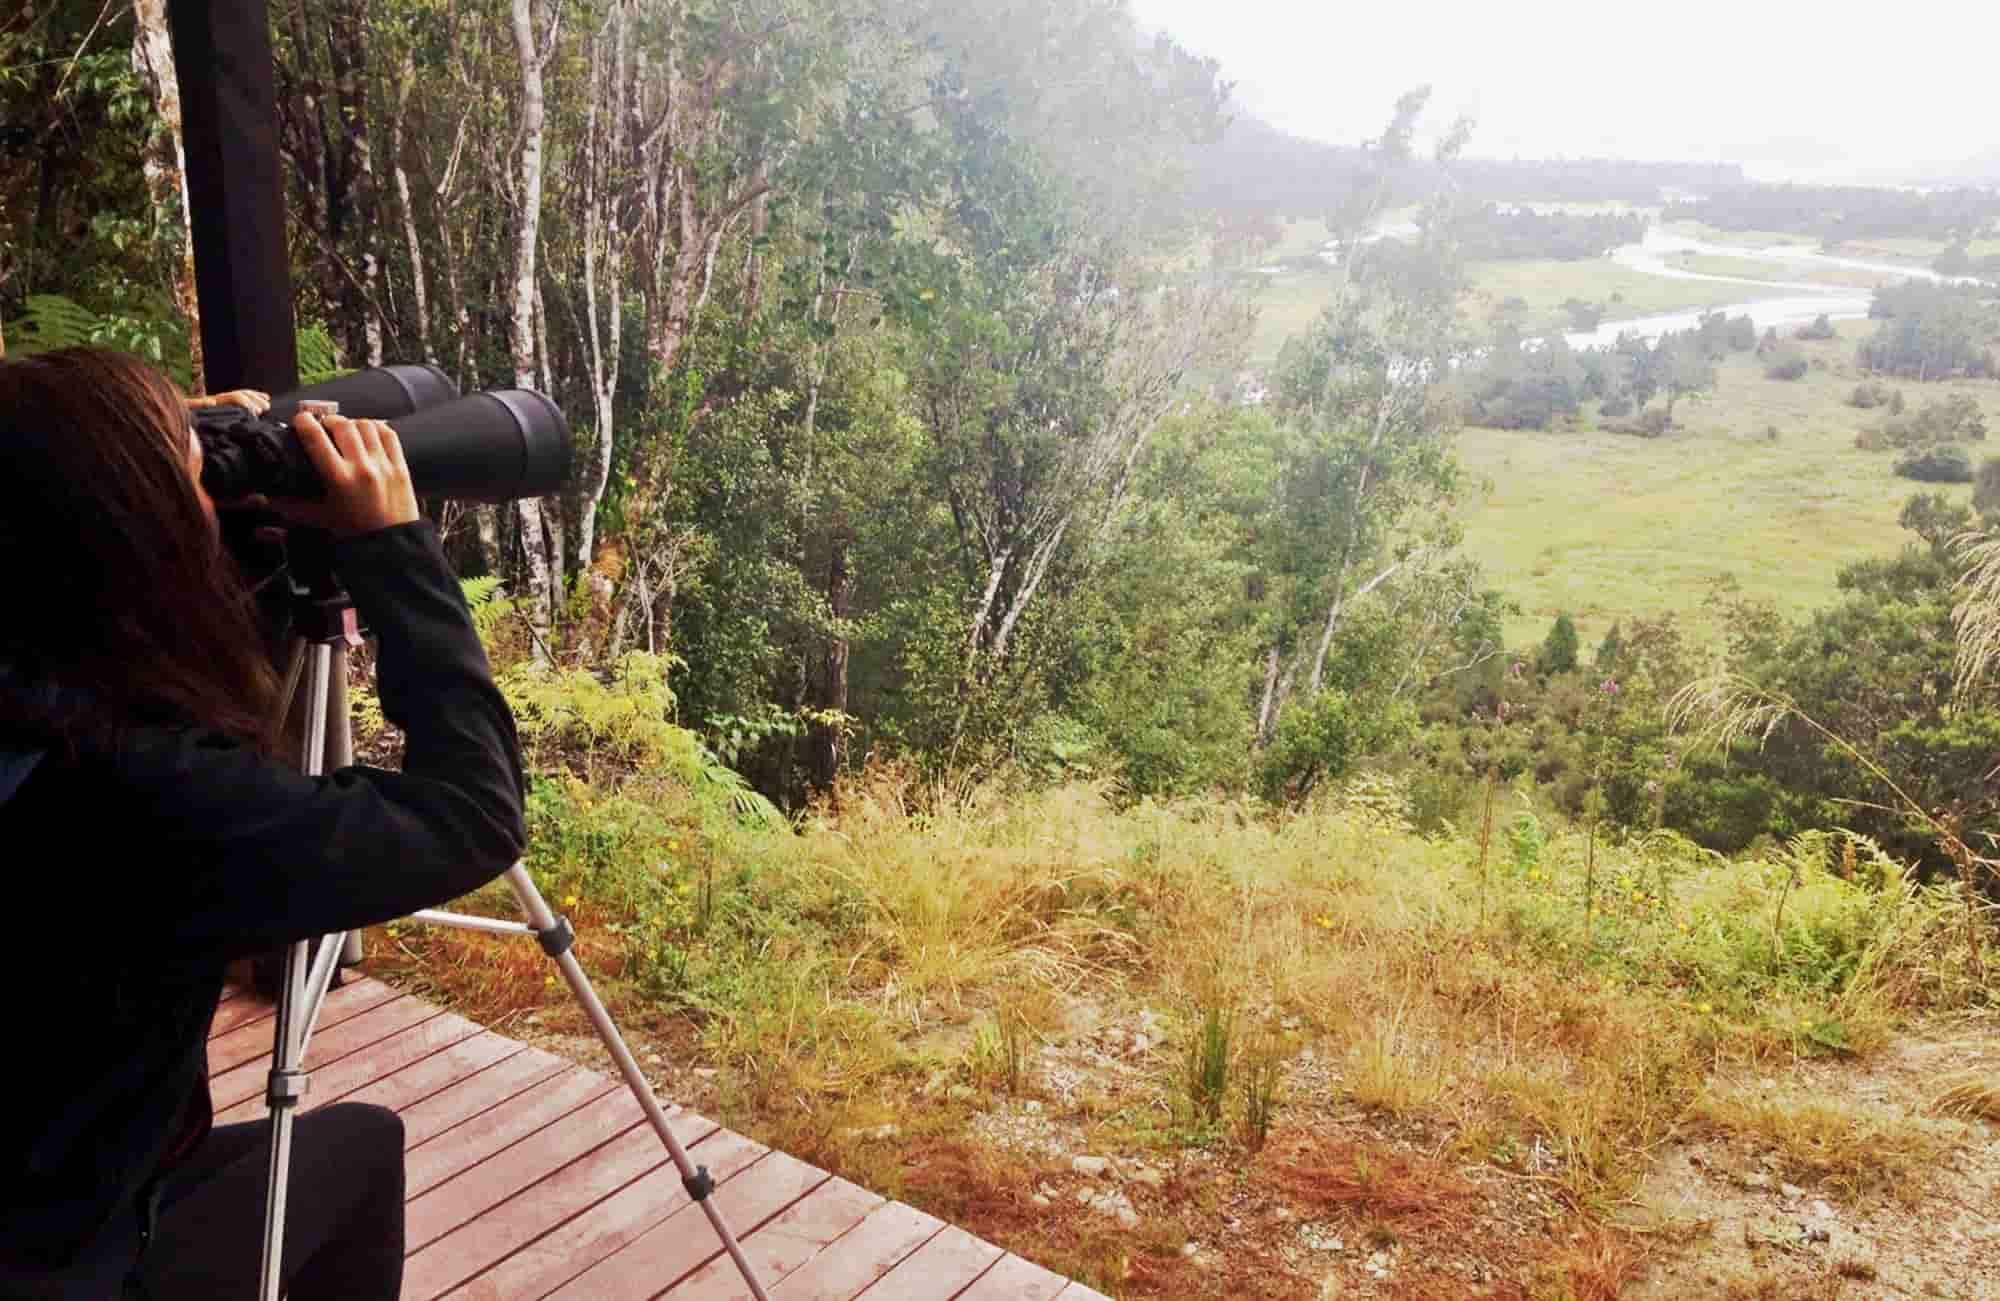 Voyage en Nouvelle-Zélande - Hokitika - Amplitudes